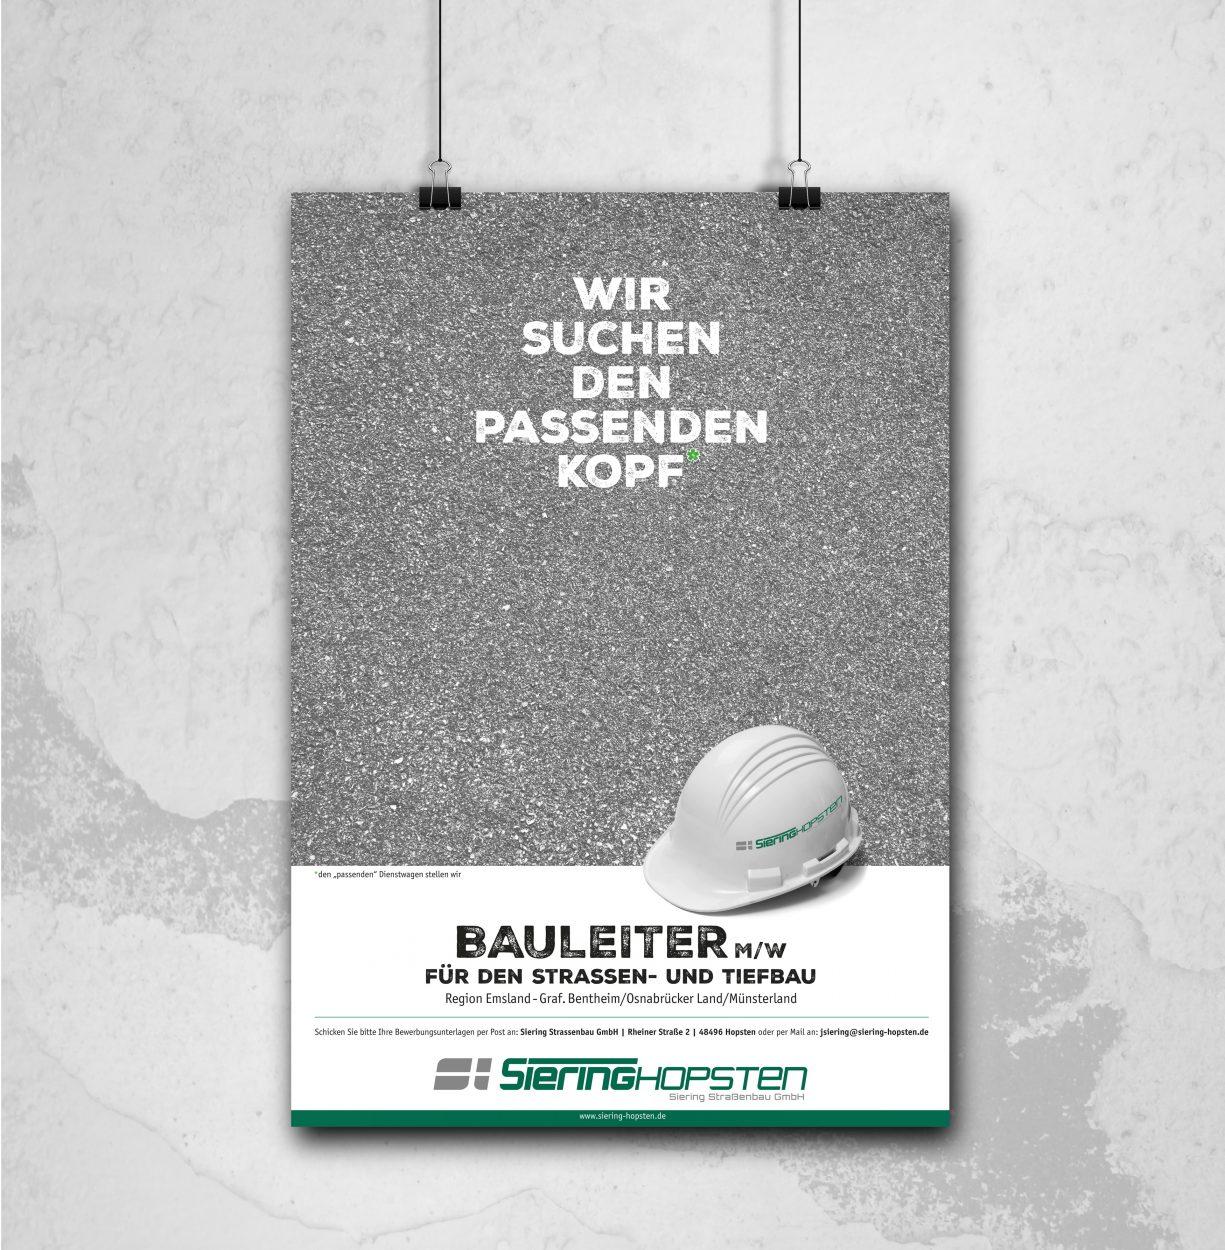 SieringHopsten-JOB-Poster